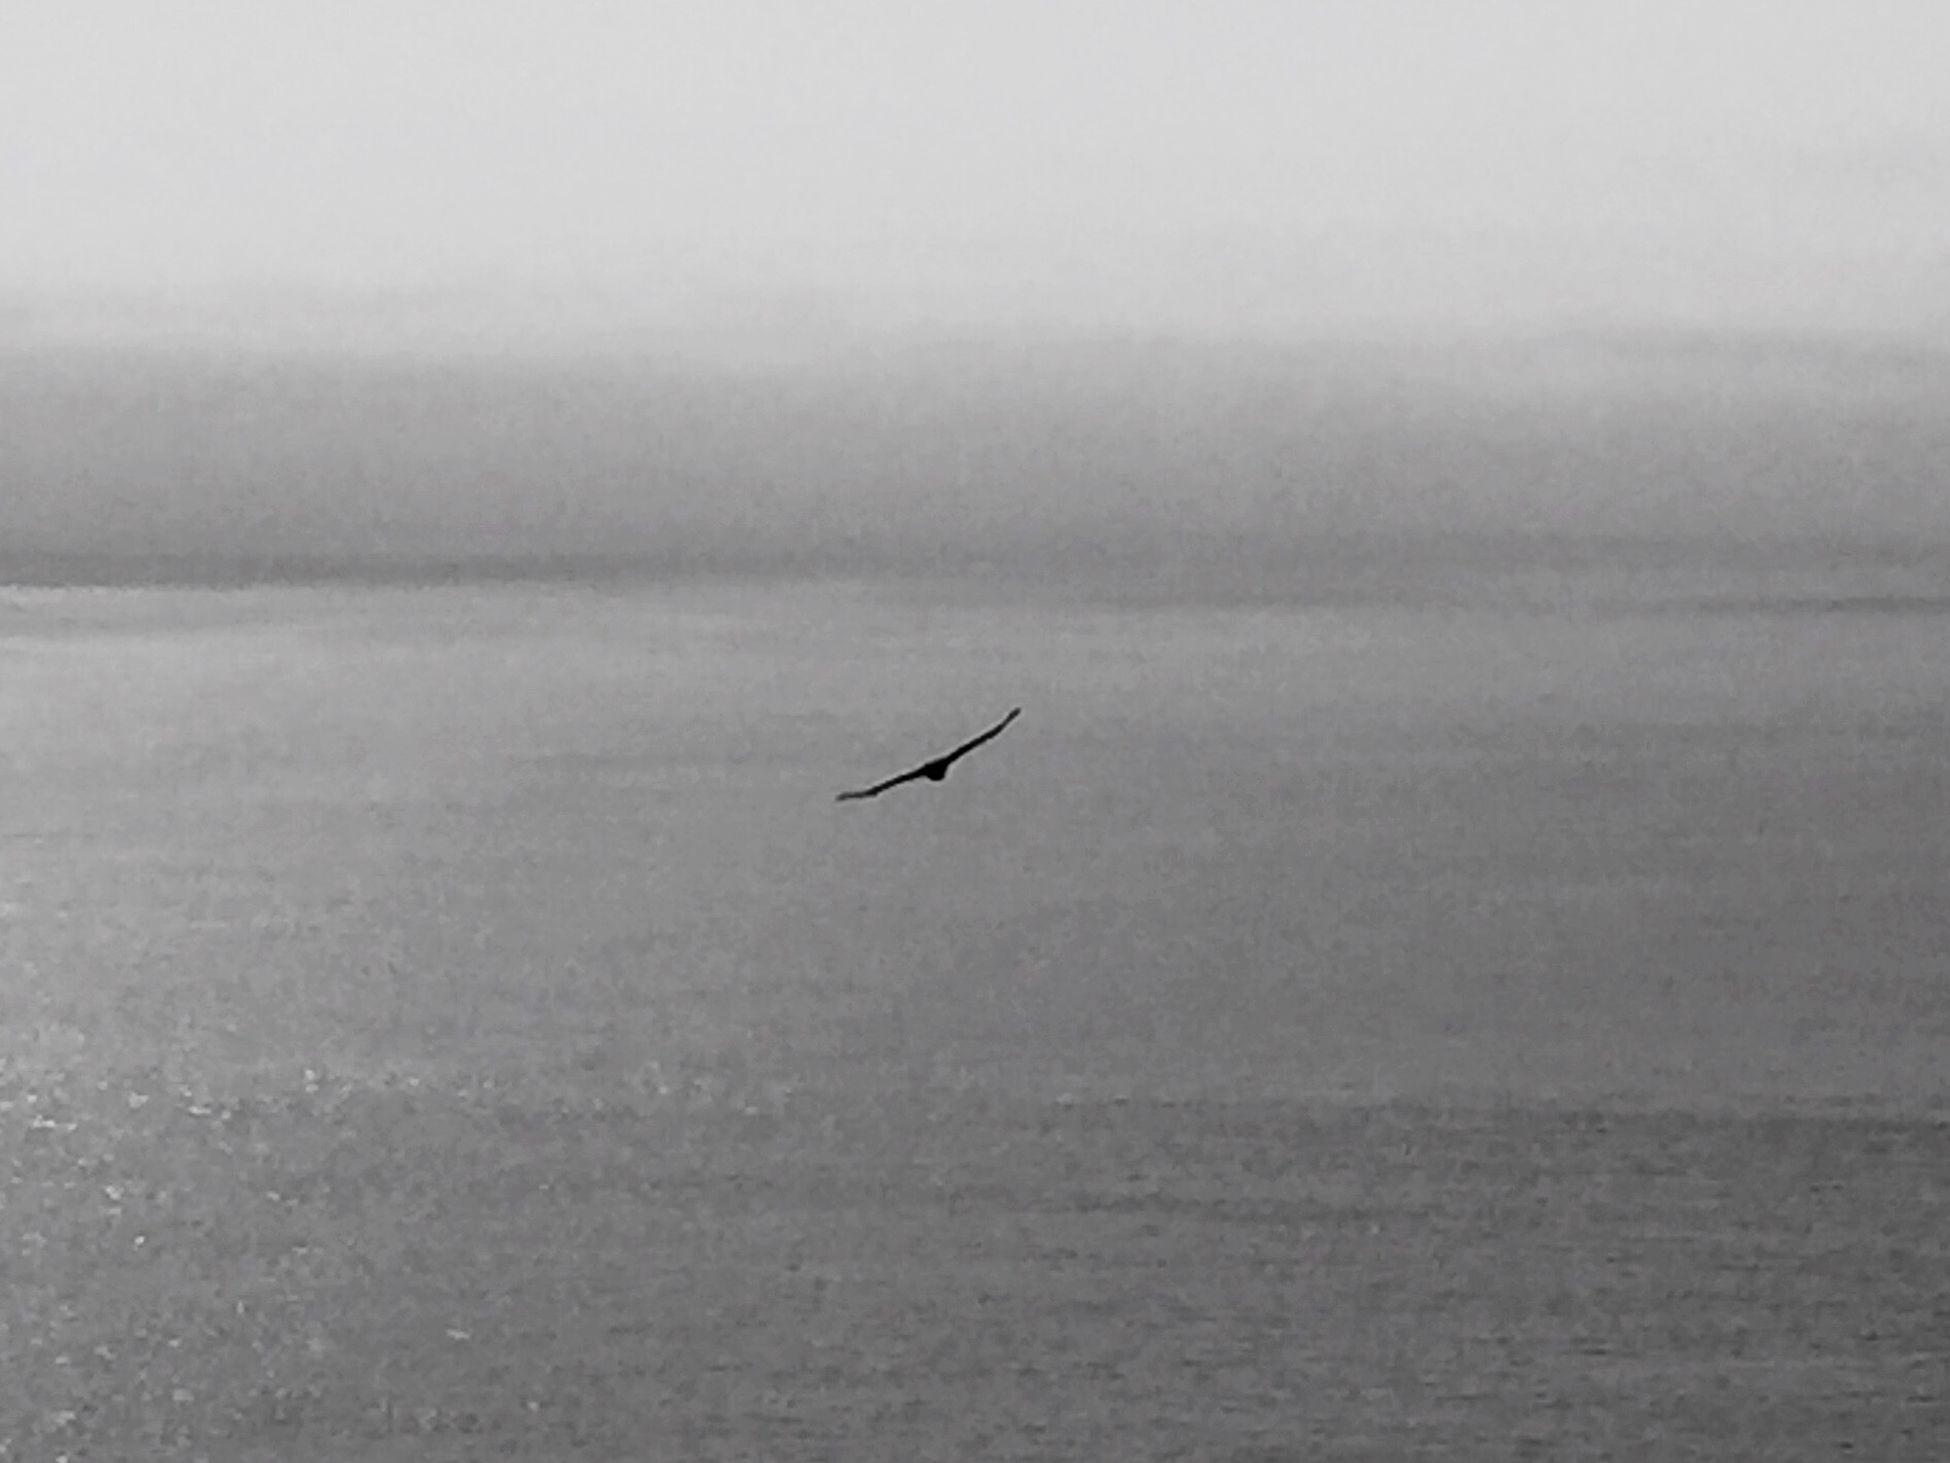 Full tilt. TruthinBigSur Big Sur TruthShot Bird Photography Flight Wings Hawk